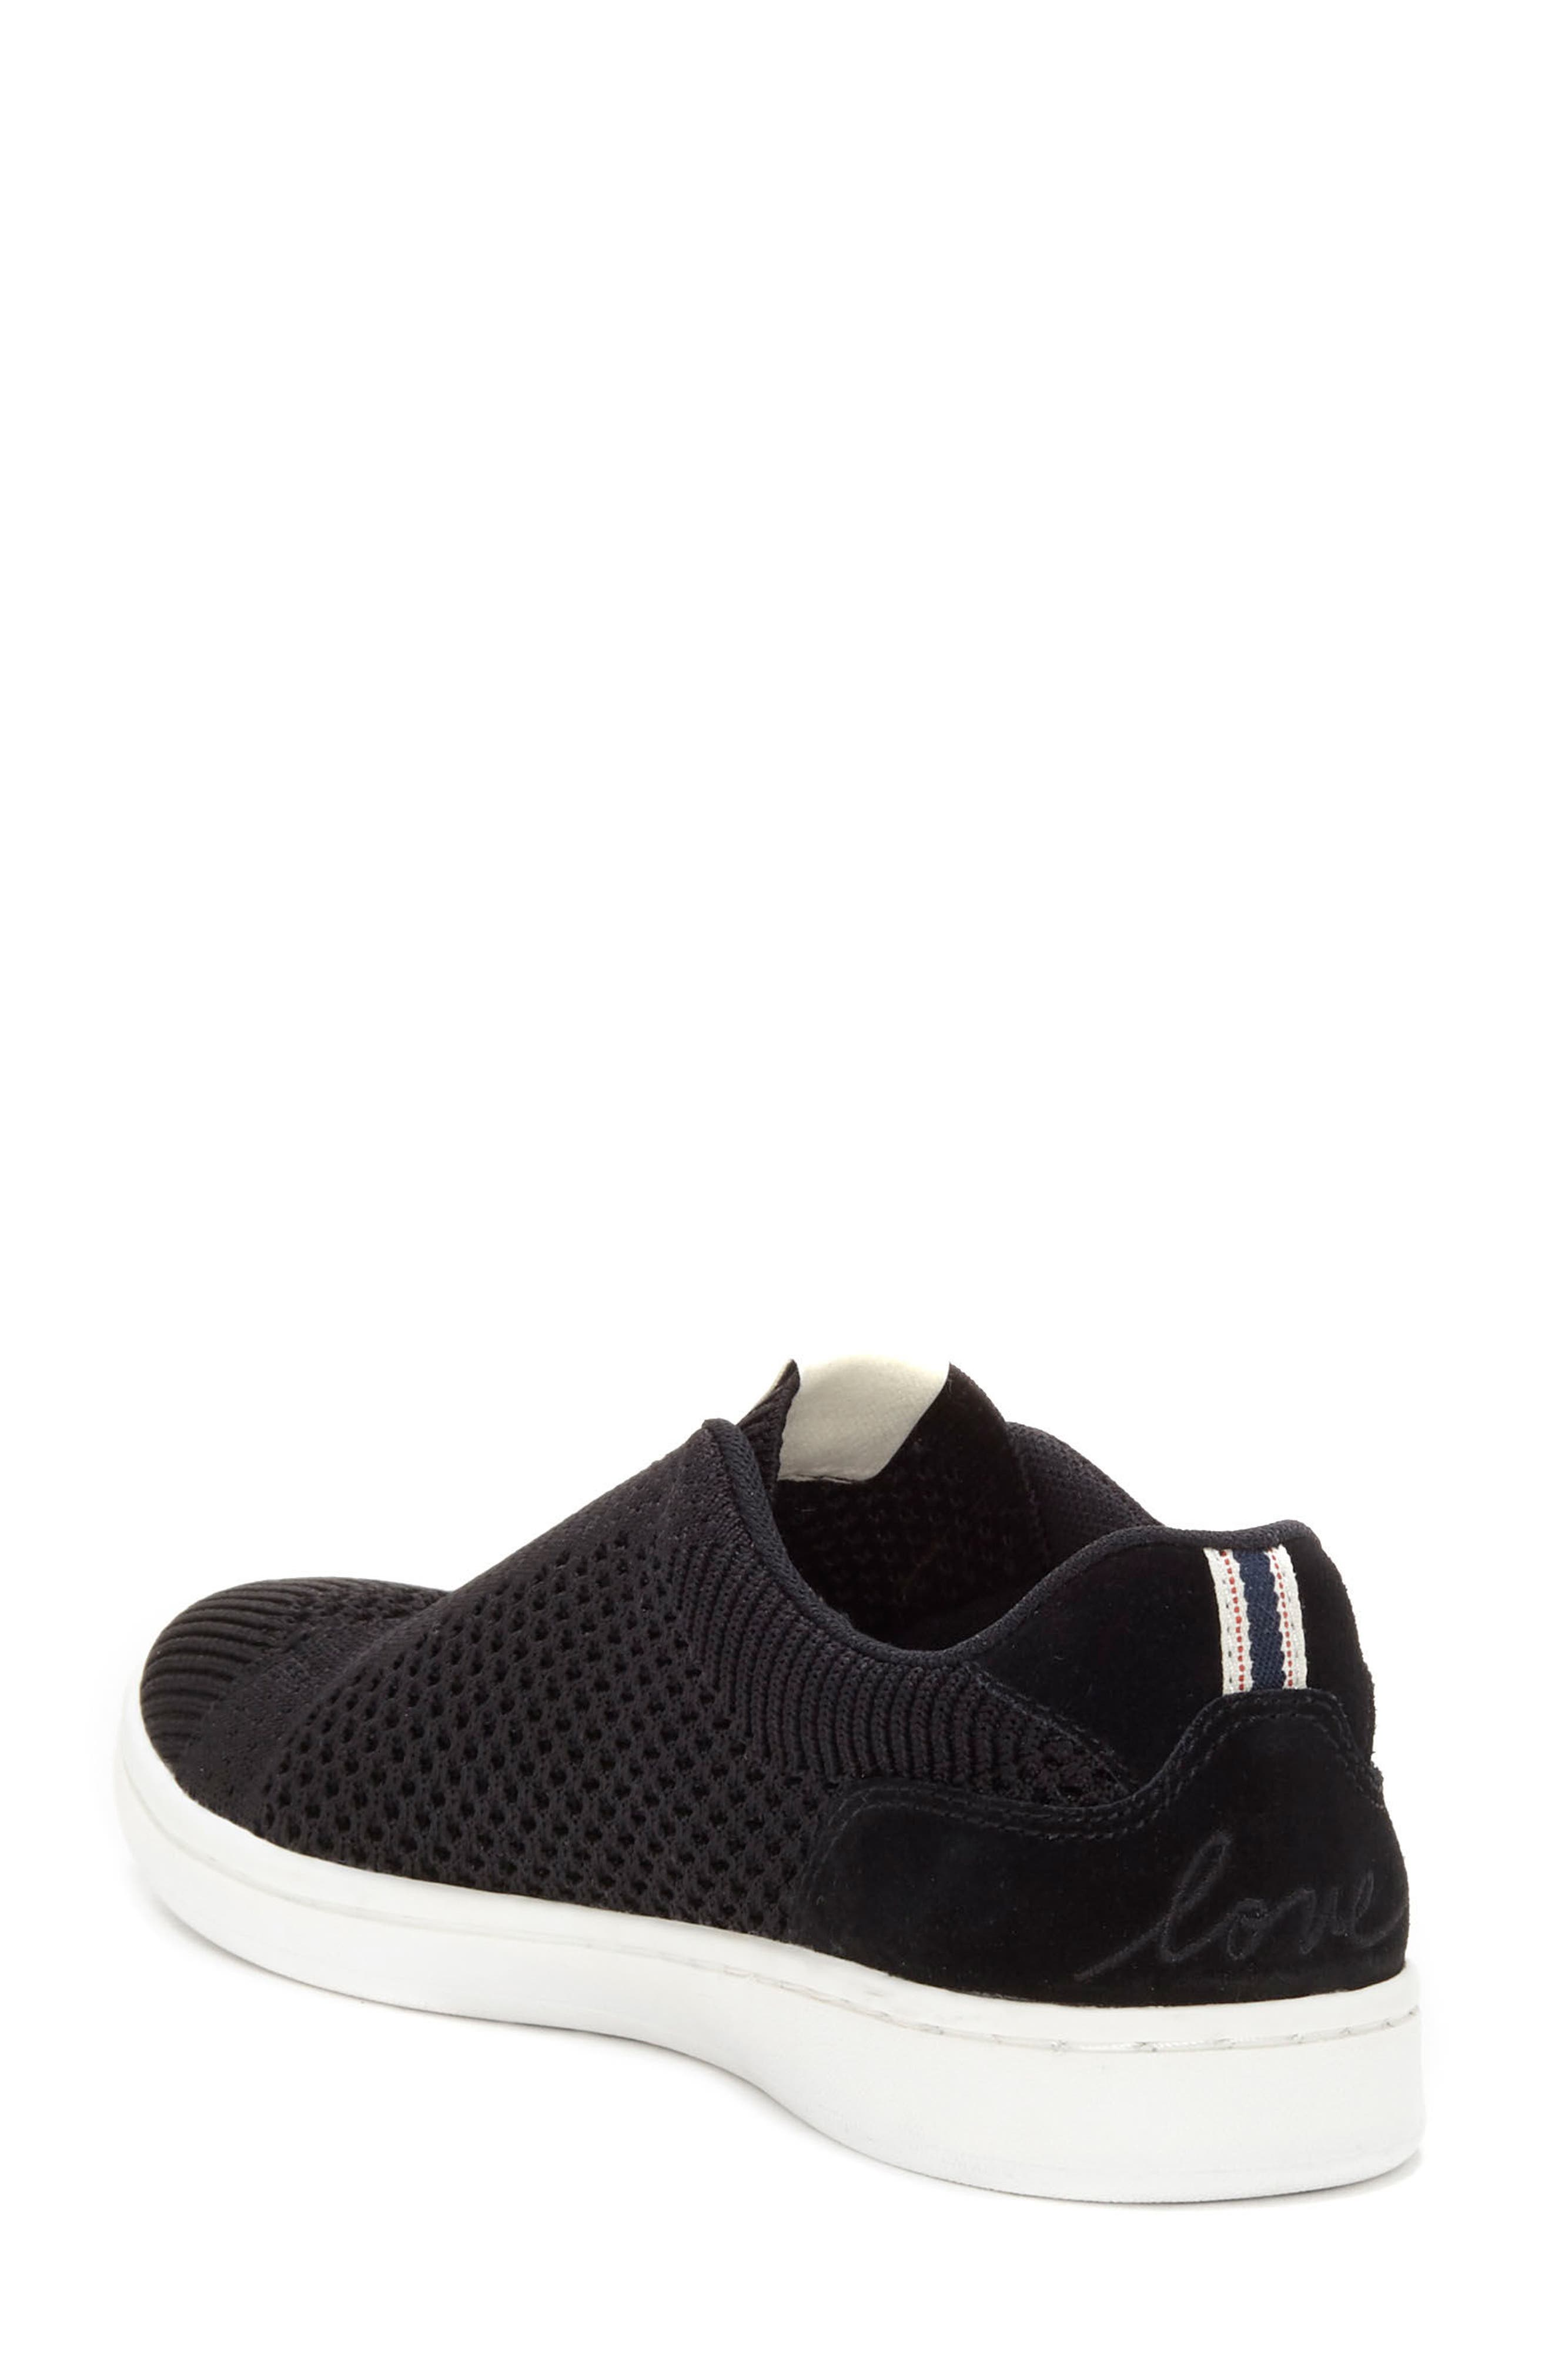 Casbey Slip-On Sneaker,                             Alternate thumbnail 2, color,                             BLACK/ BLACK FABRIC